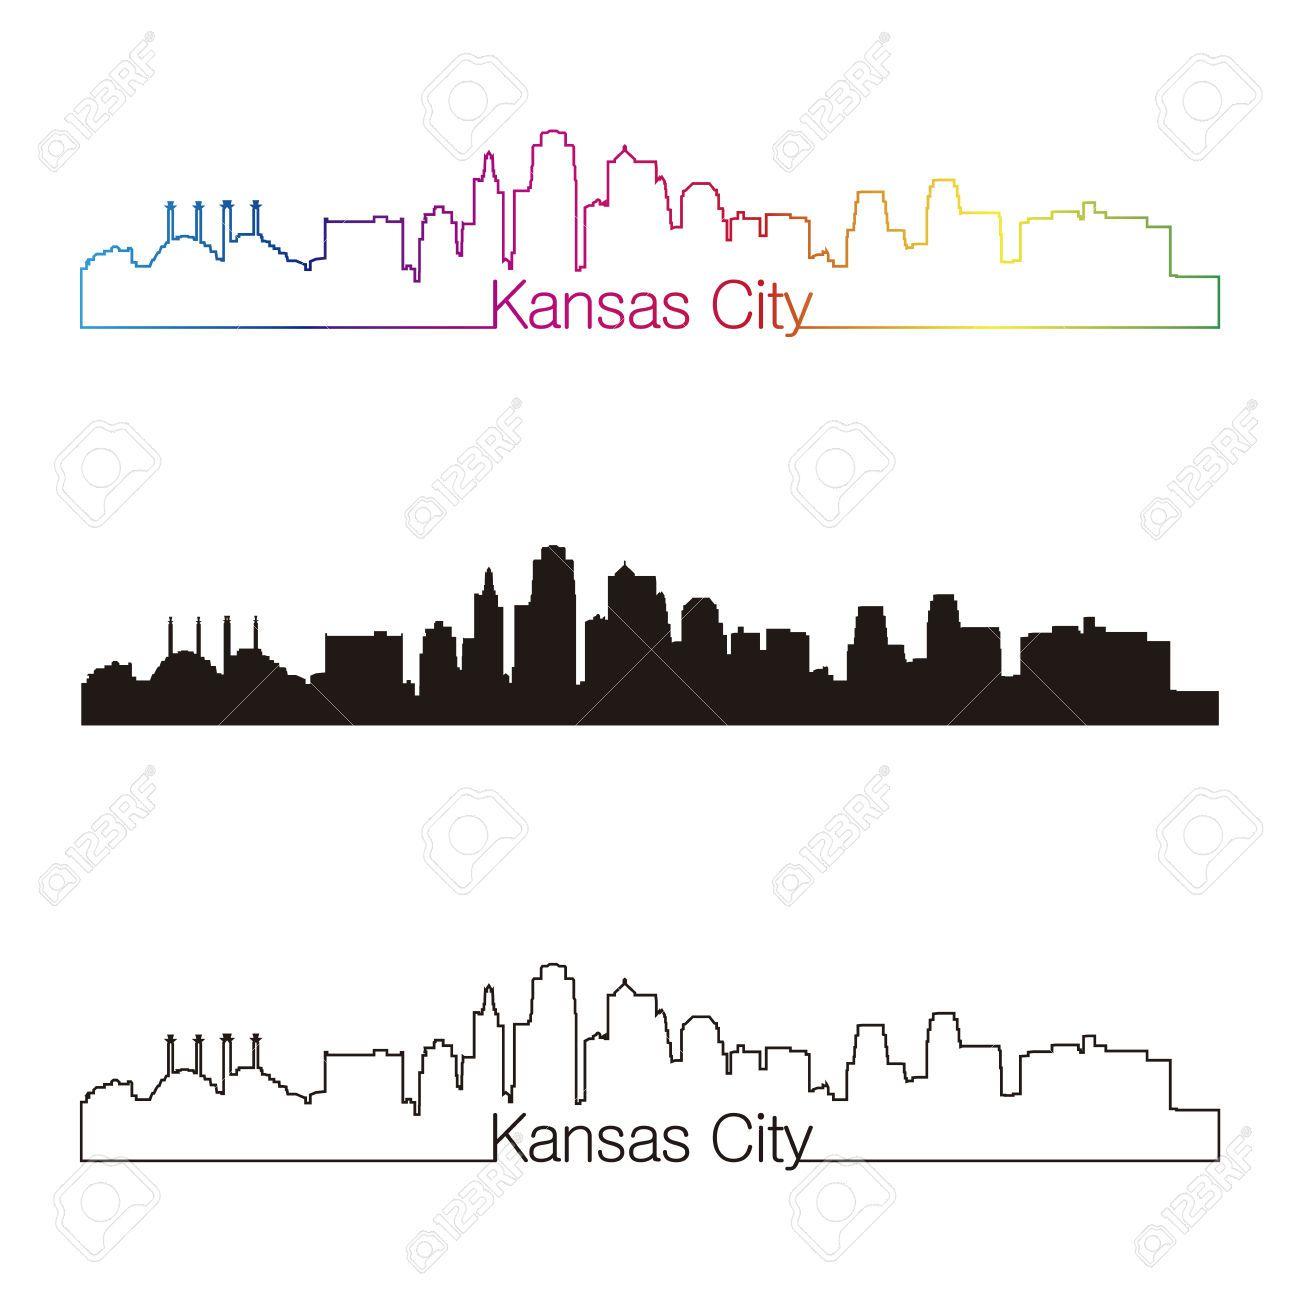 Paul Rommer Kc Skyline Outline Tattoo Idea Kansas City Skyline Kansas City City Silhouette